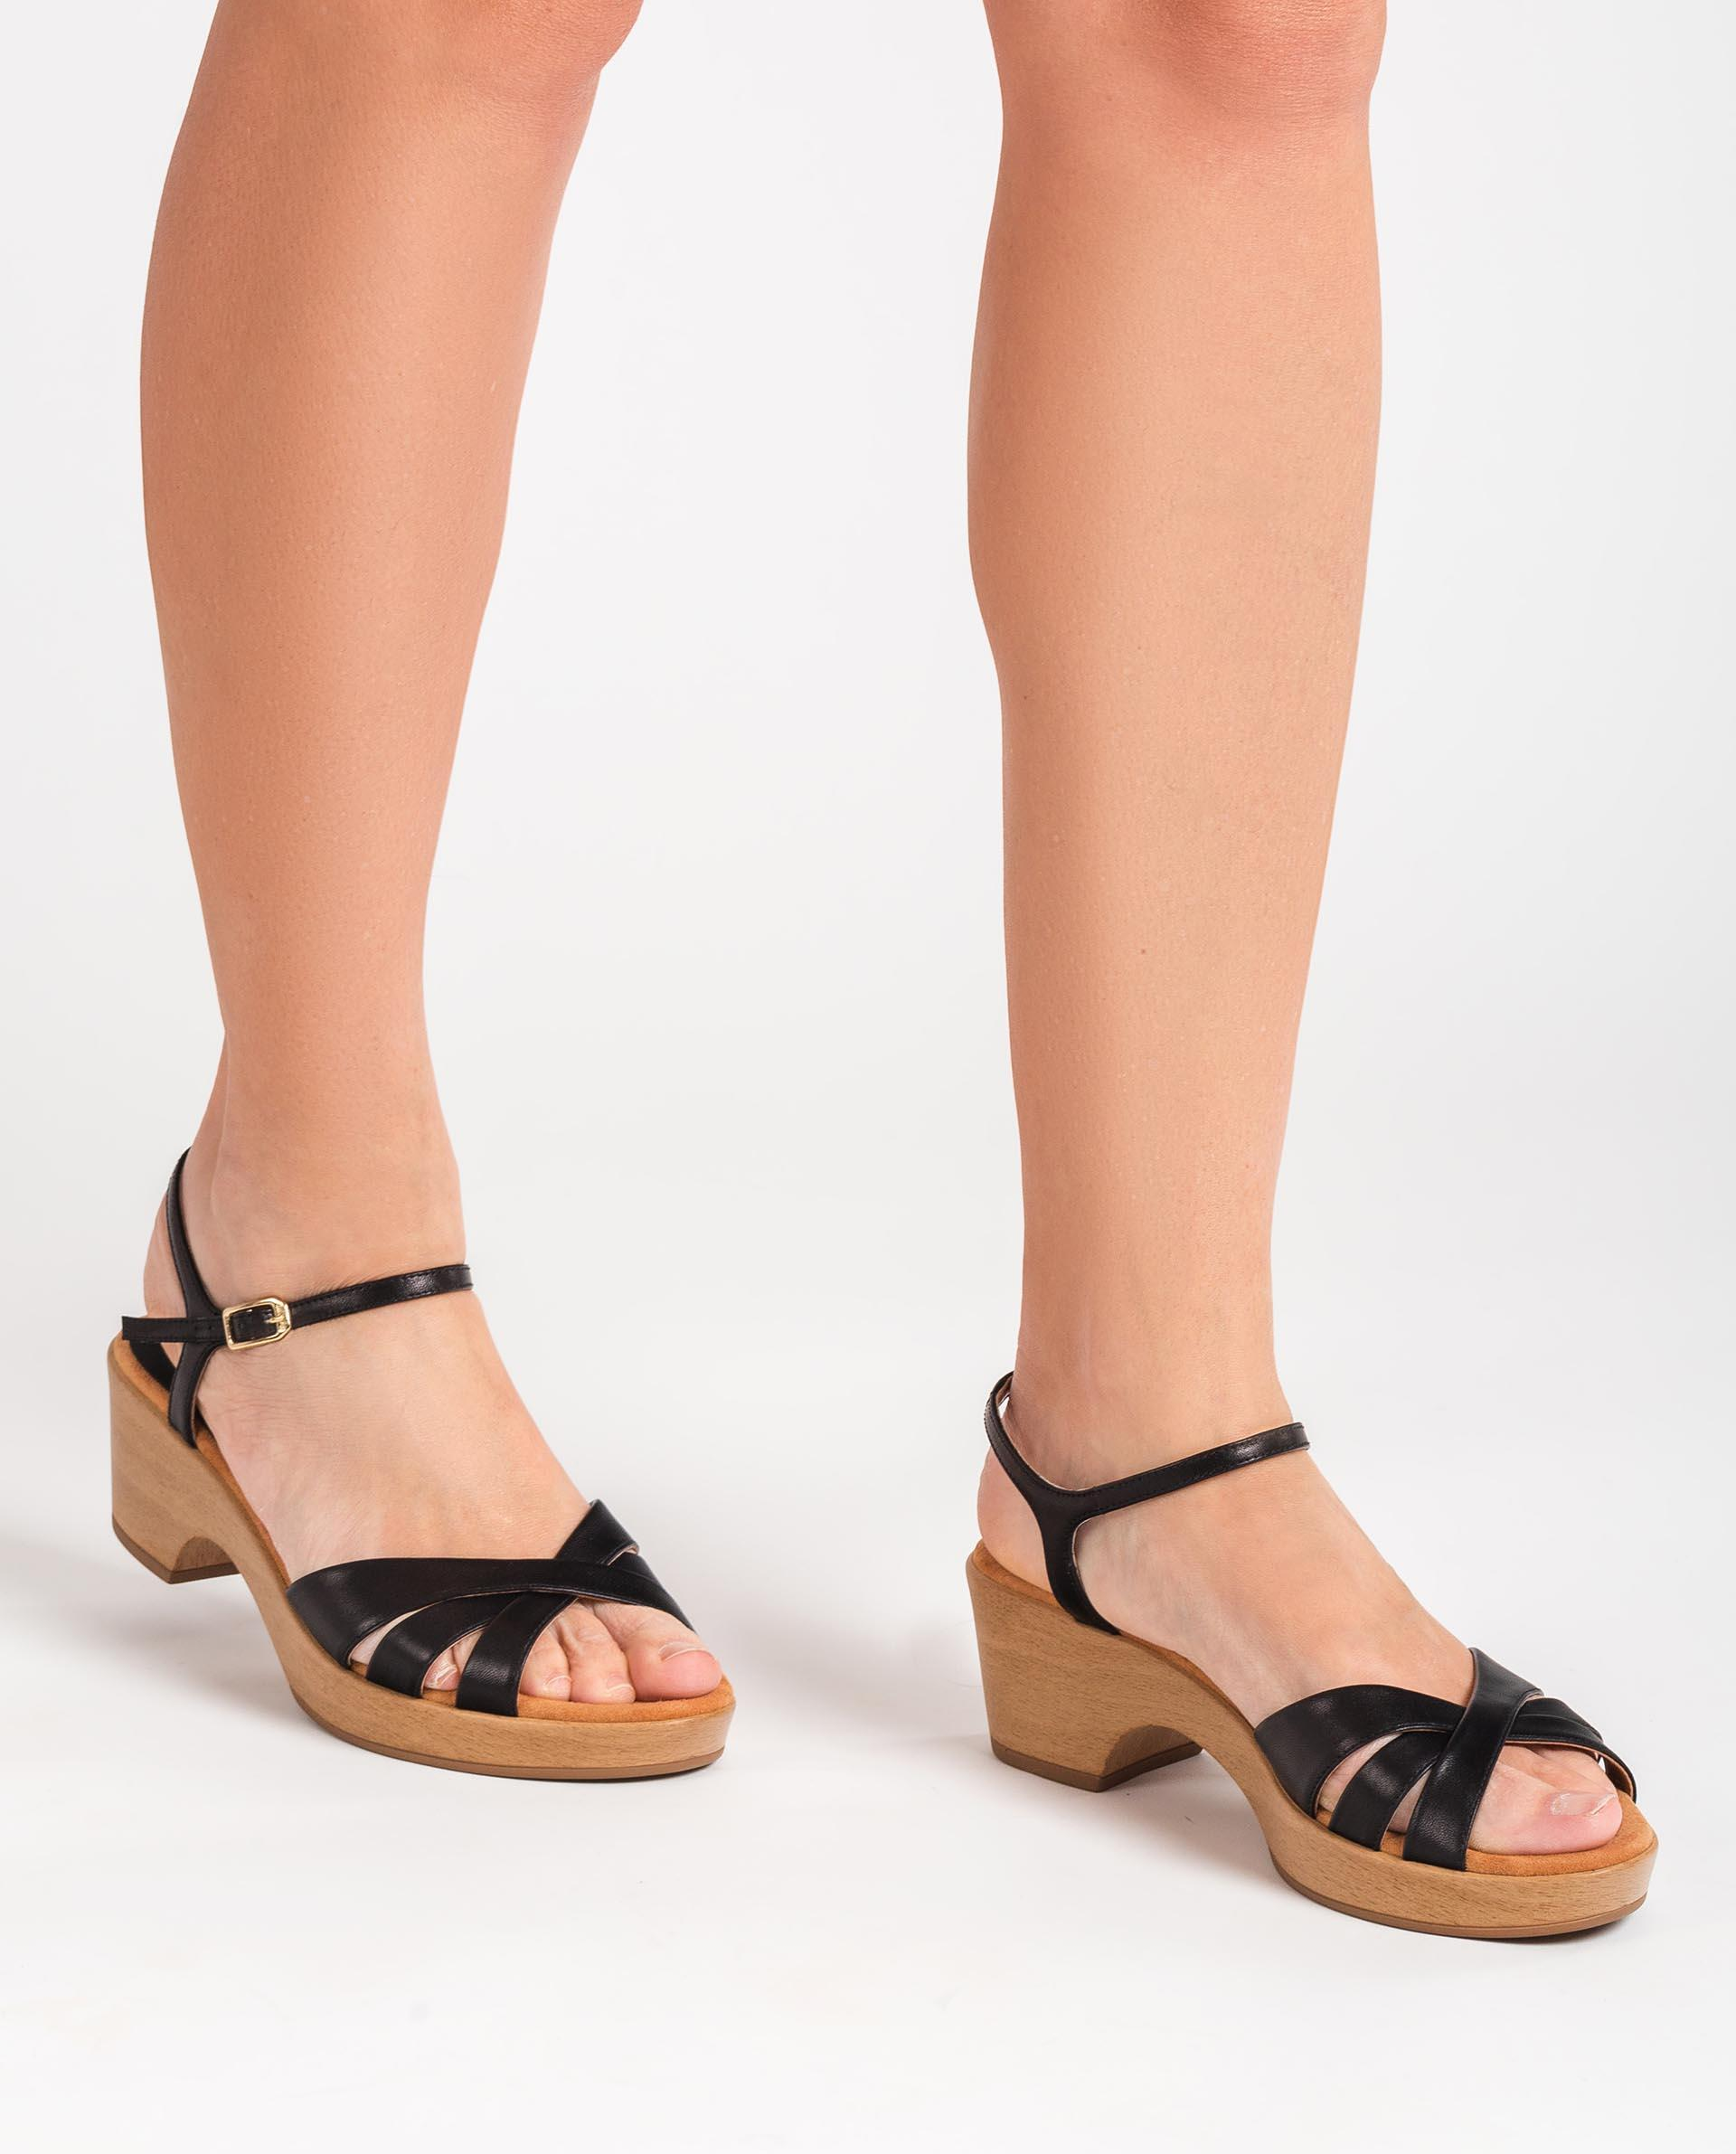 UNISA Leather strappy sandals INQUI_NA 2